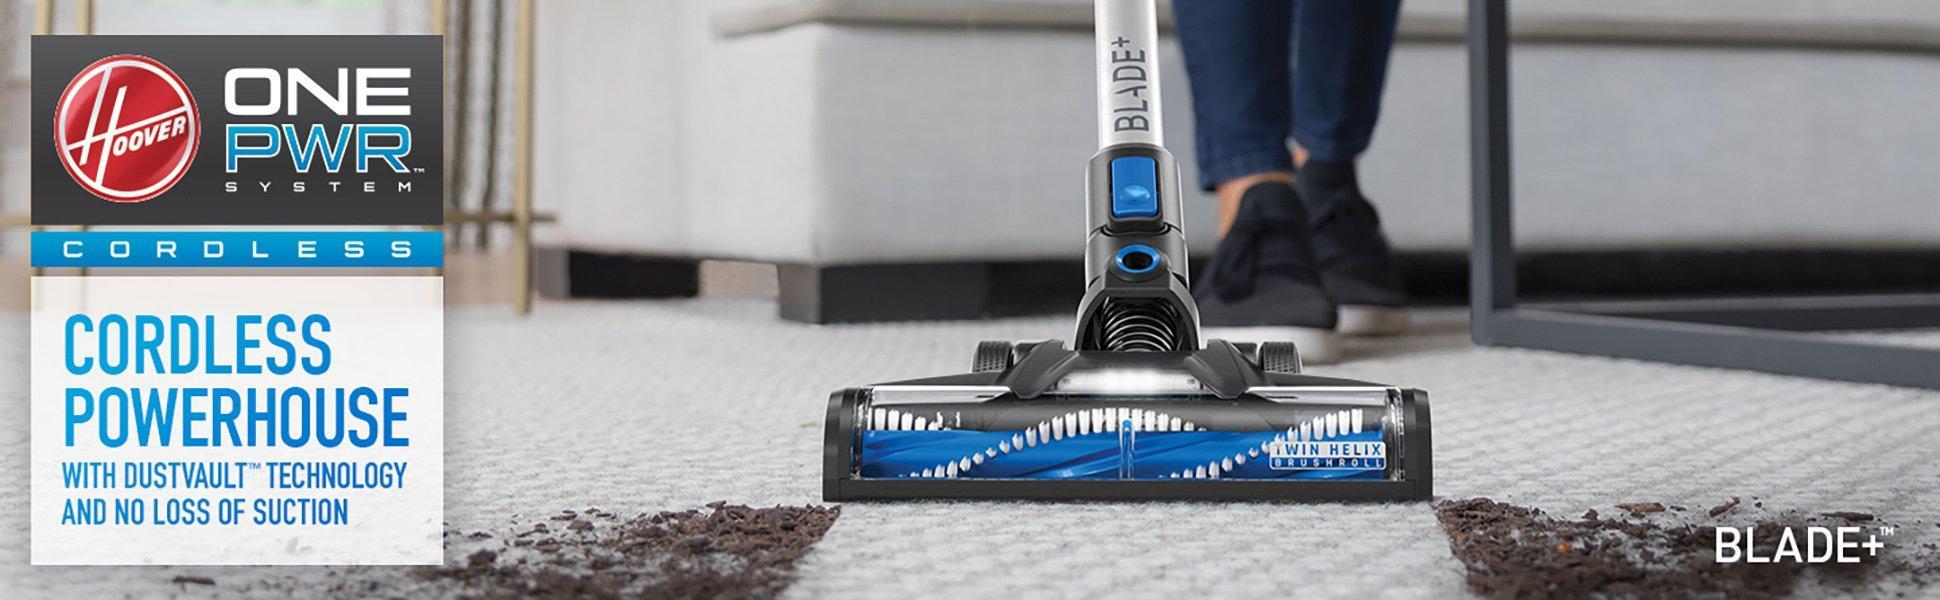 onepwr blade cordless vacuum kit bh53310. Black Bedroom Furniture Sets. Home Design Ideas